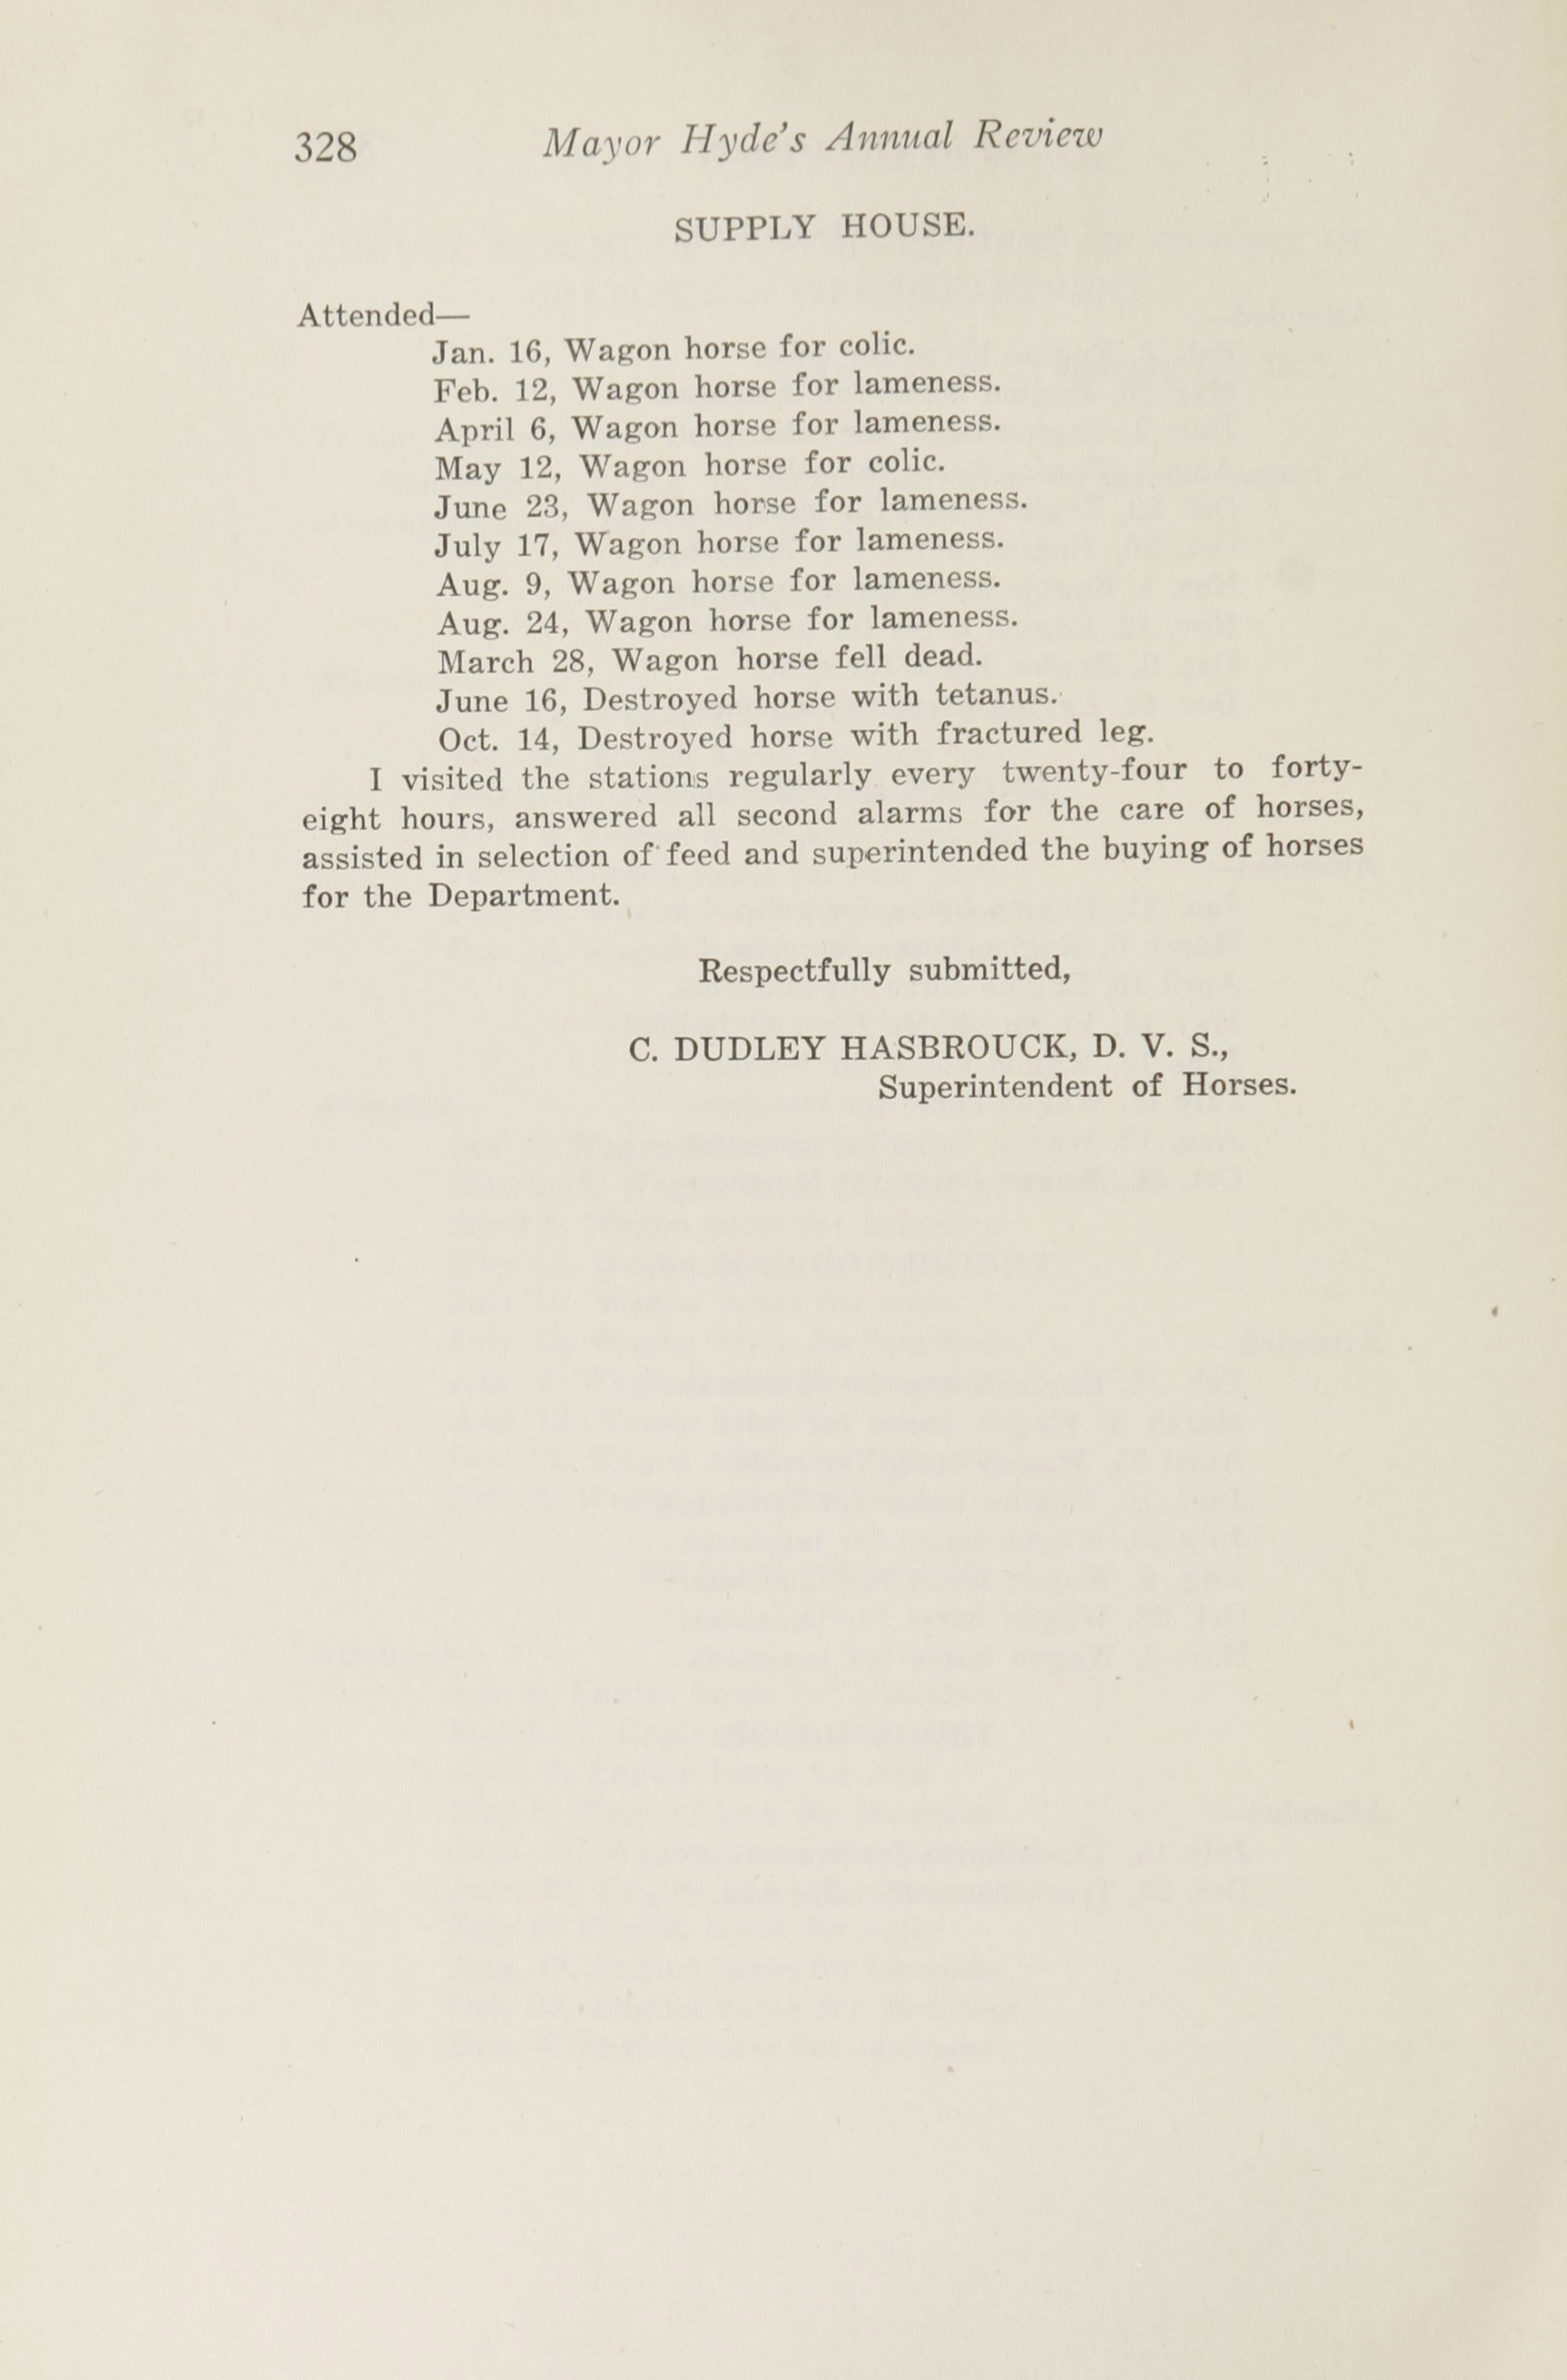 Charleston Yearbook, 1916, page 328